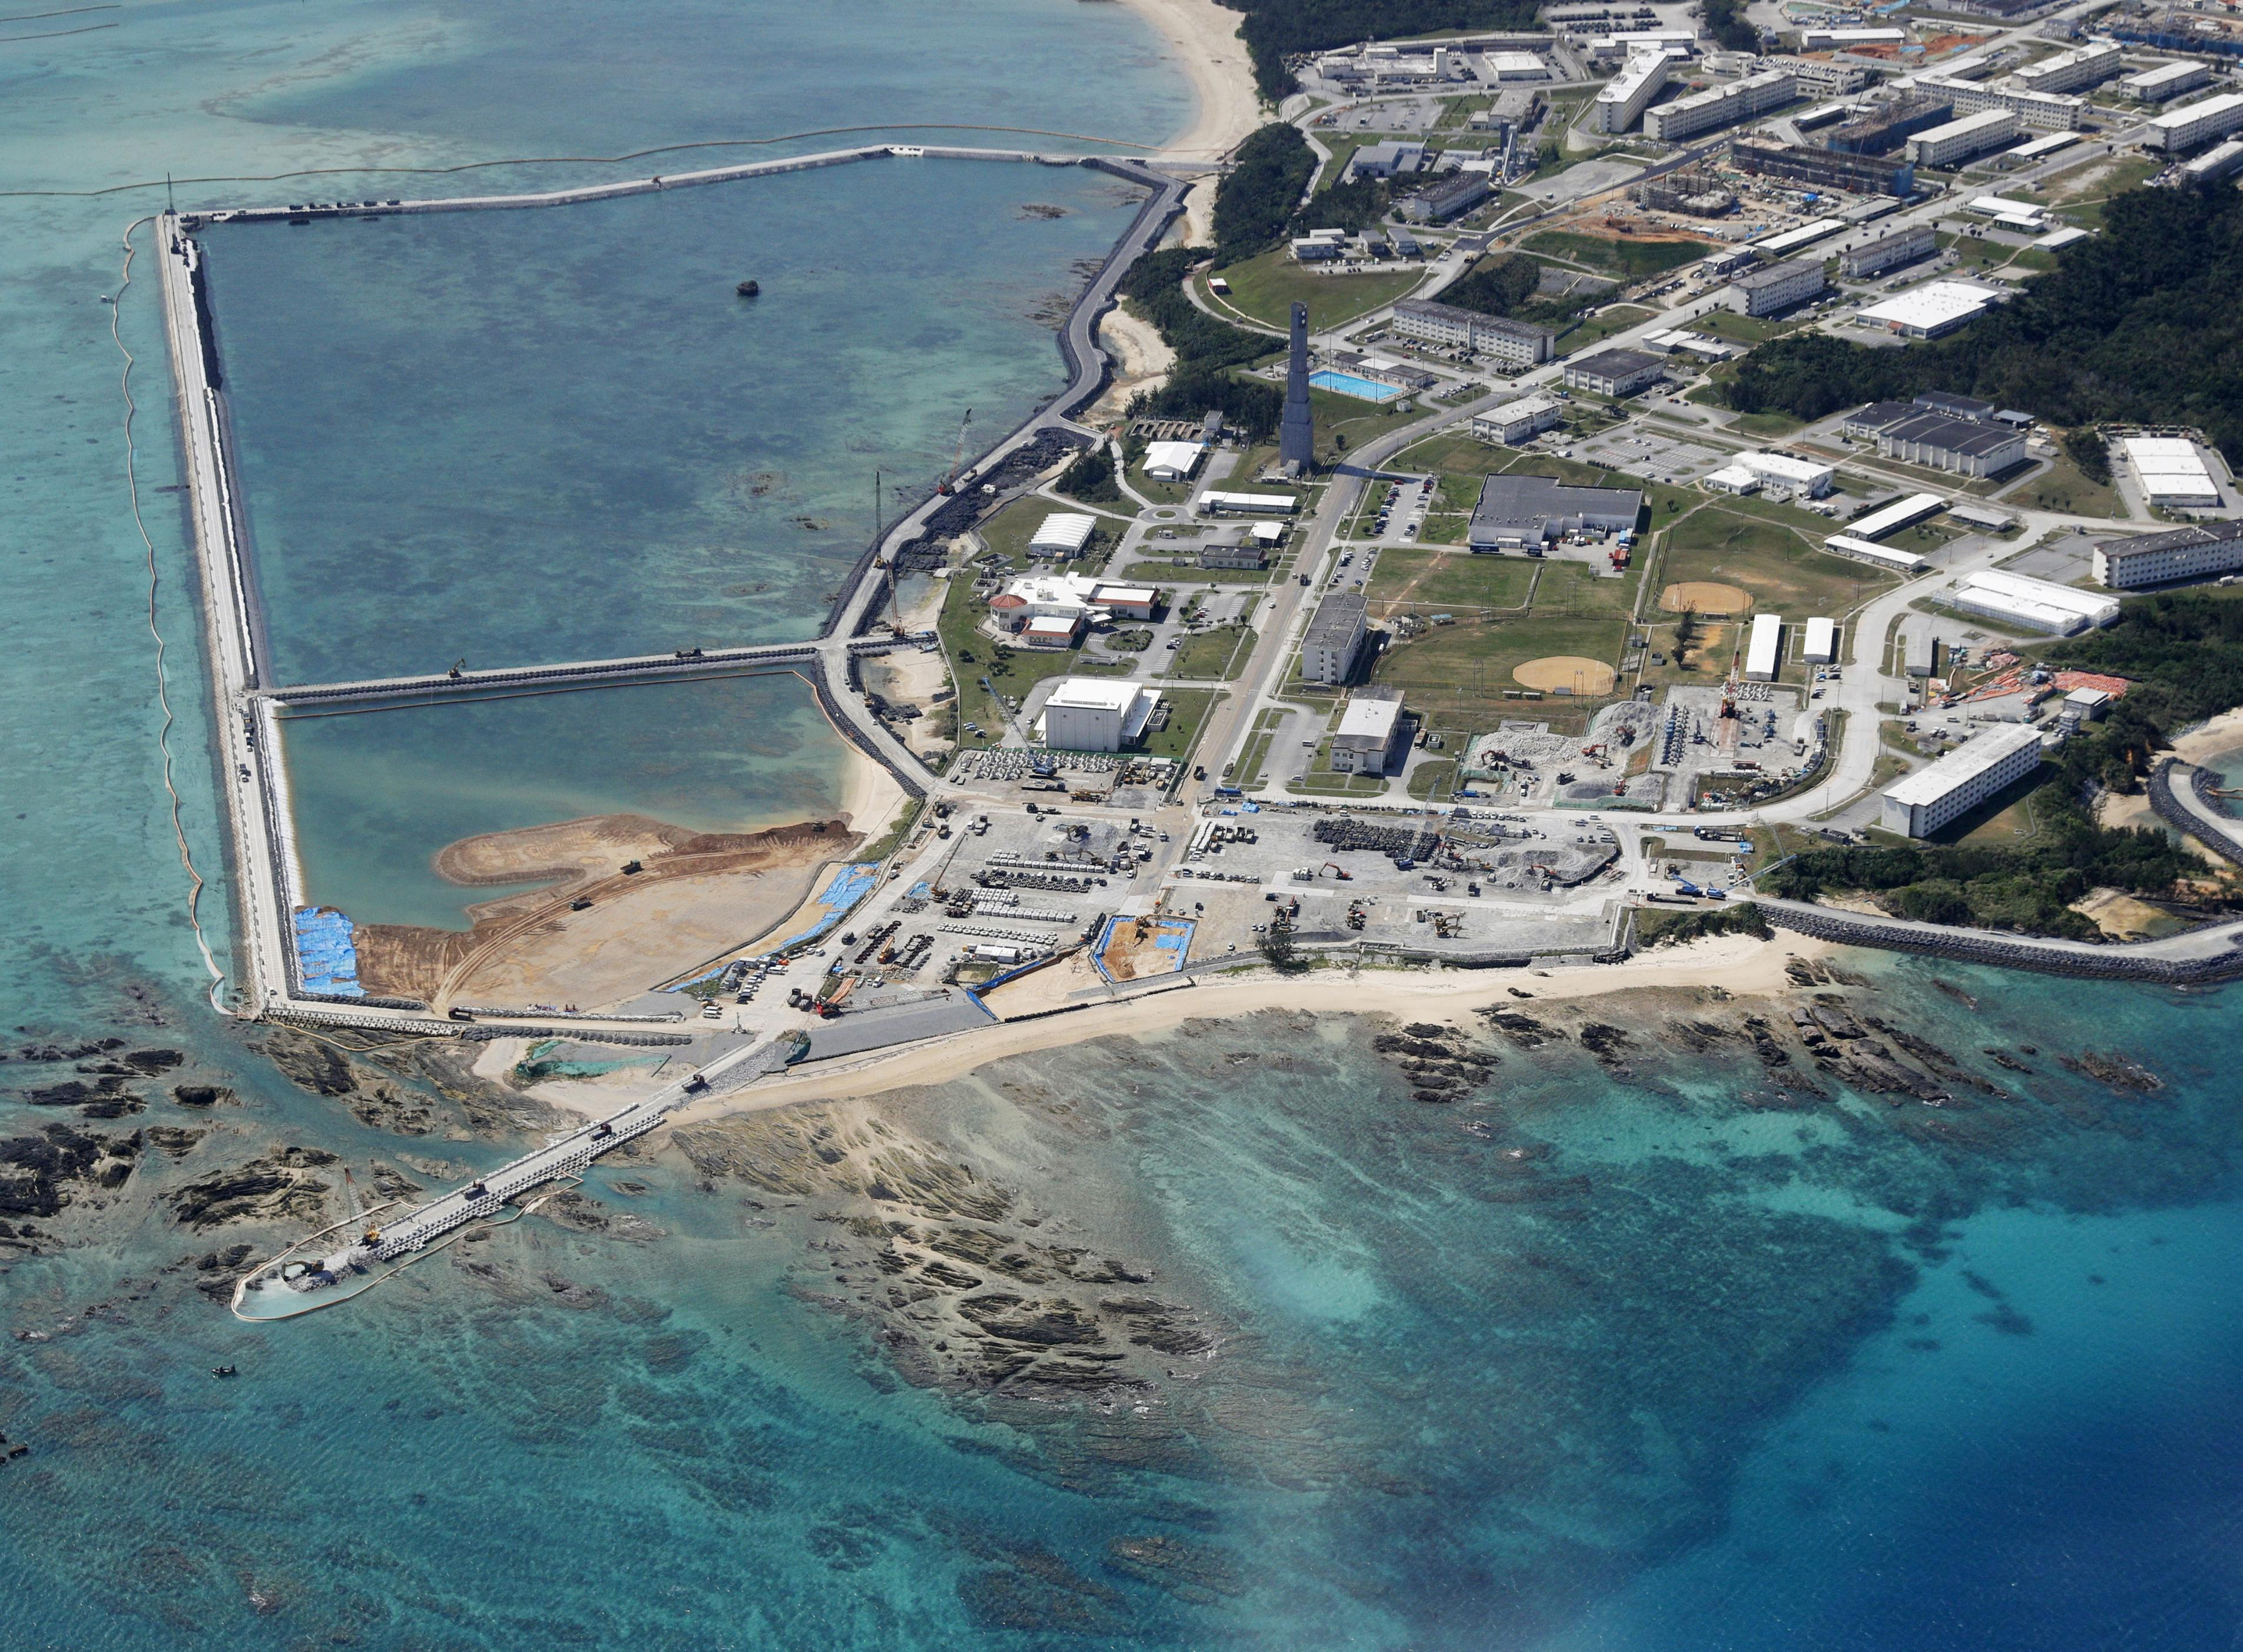 Japan to push ahead with U.S. base relocation despite Okinawa...